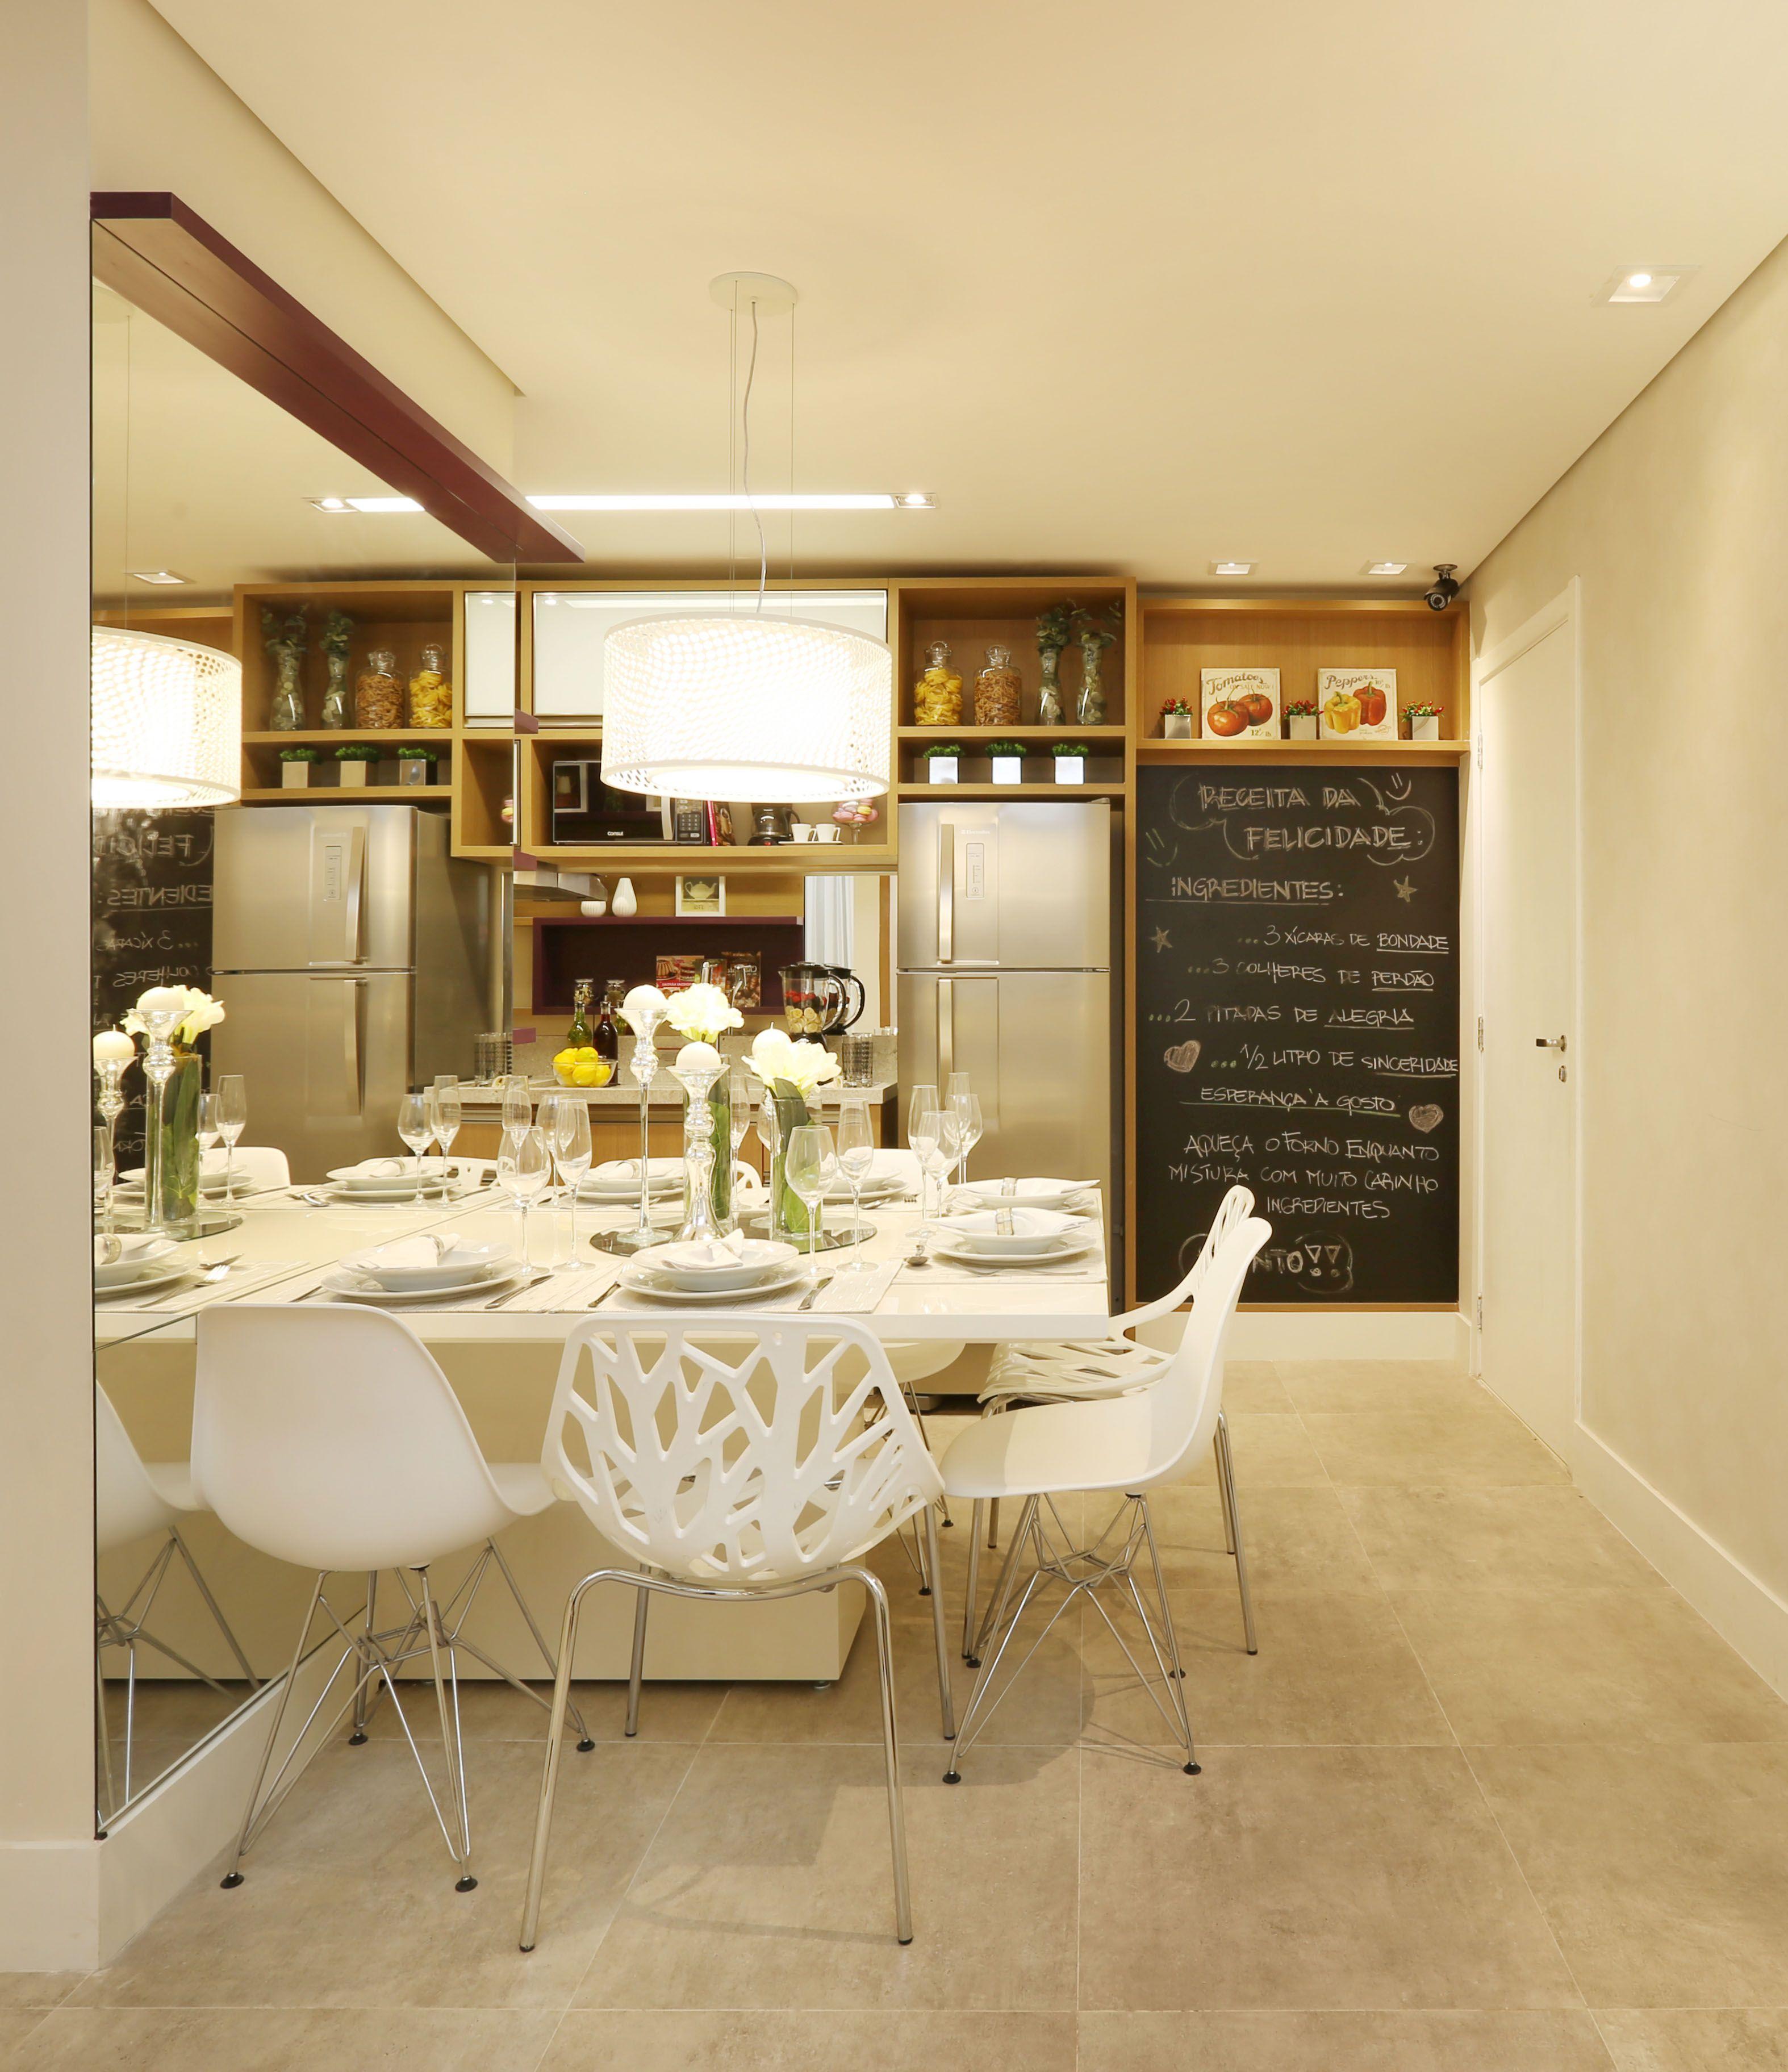 Cozinha Aberta Integrada A Sala De Jantar Cozinhaamericana